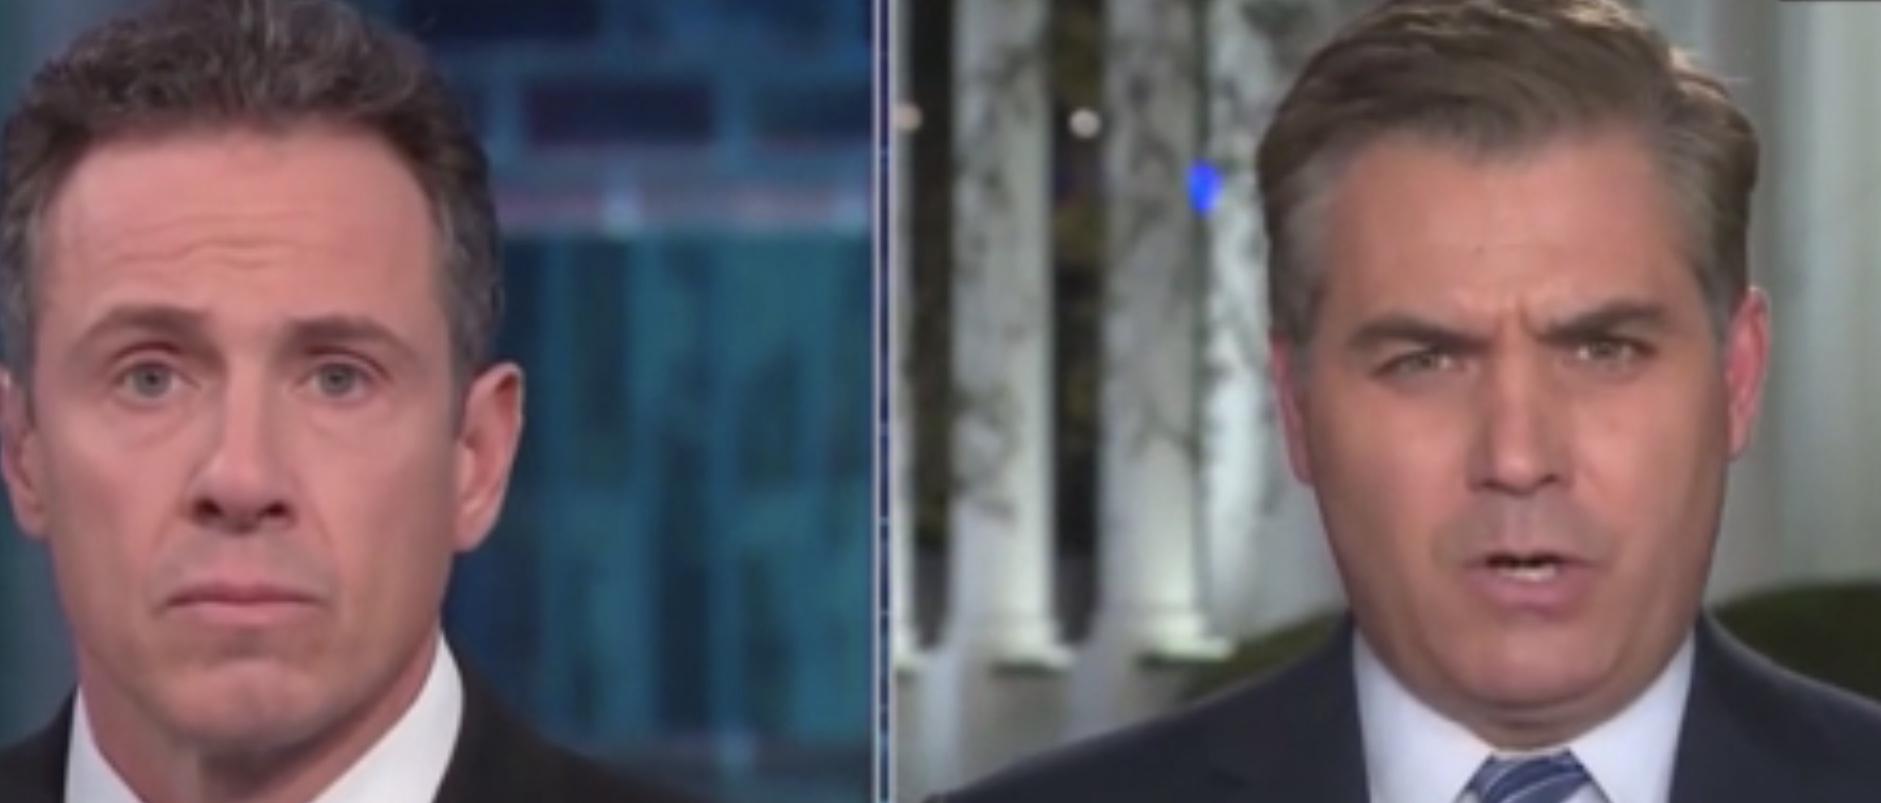 CNN's Jim Acosta: Trump Calling Coronavirus 'Foreign' Is Xenophobic